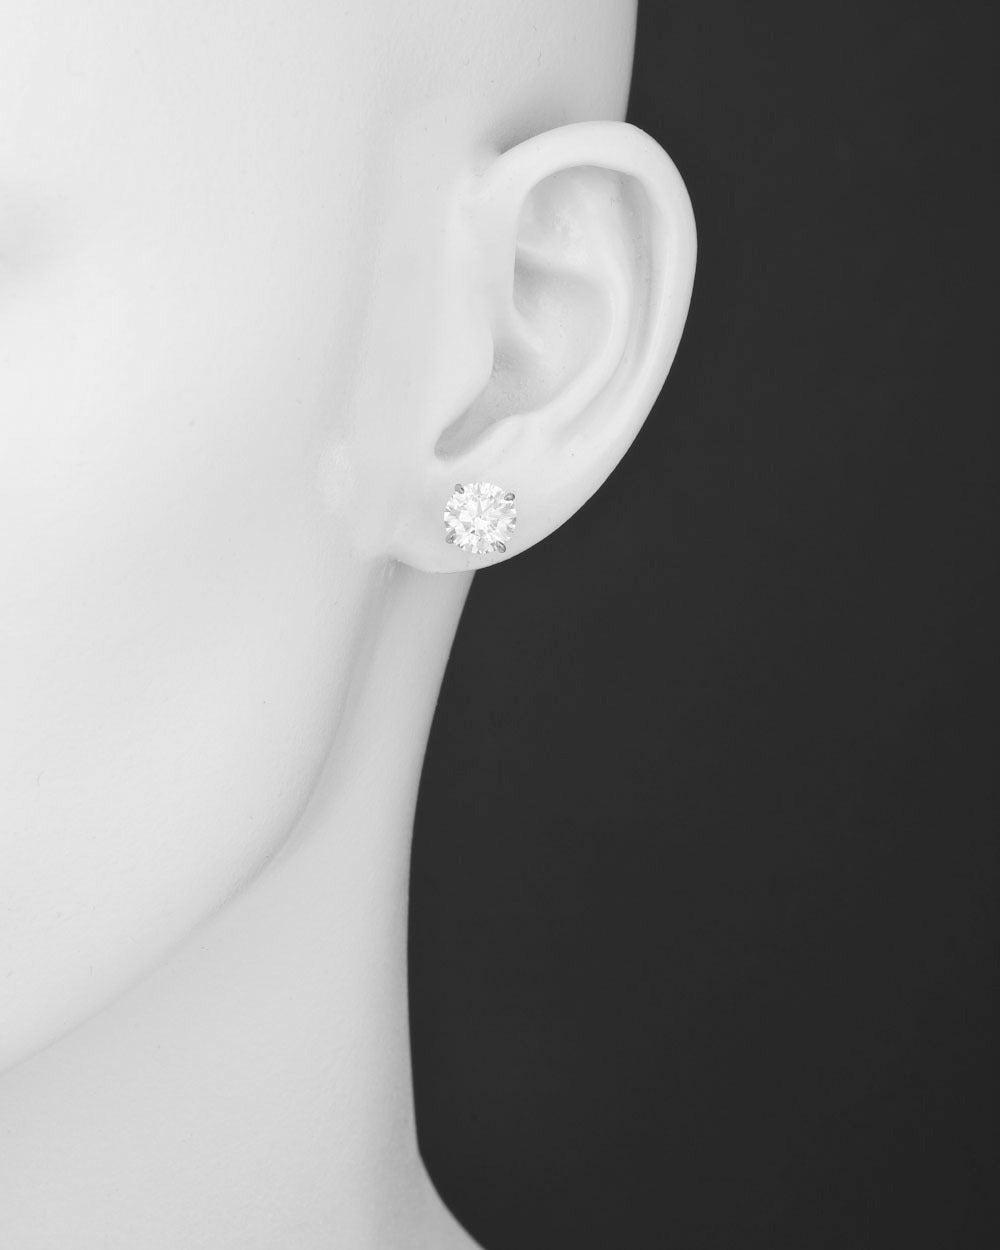 Round Brilliant Diamond Stud Earrings (4.29 ct tw) 2